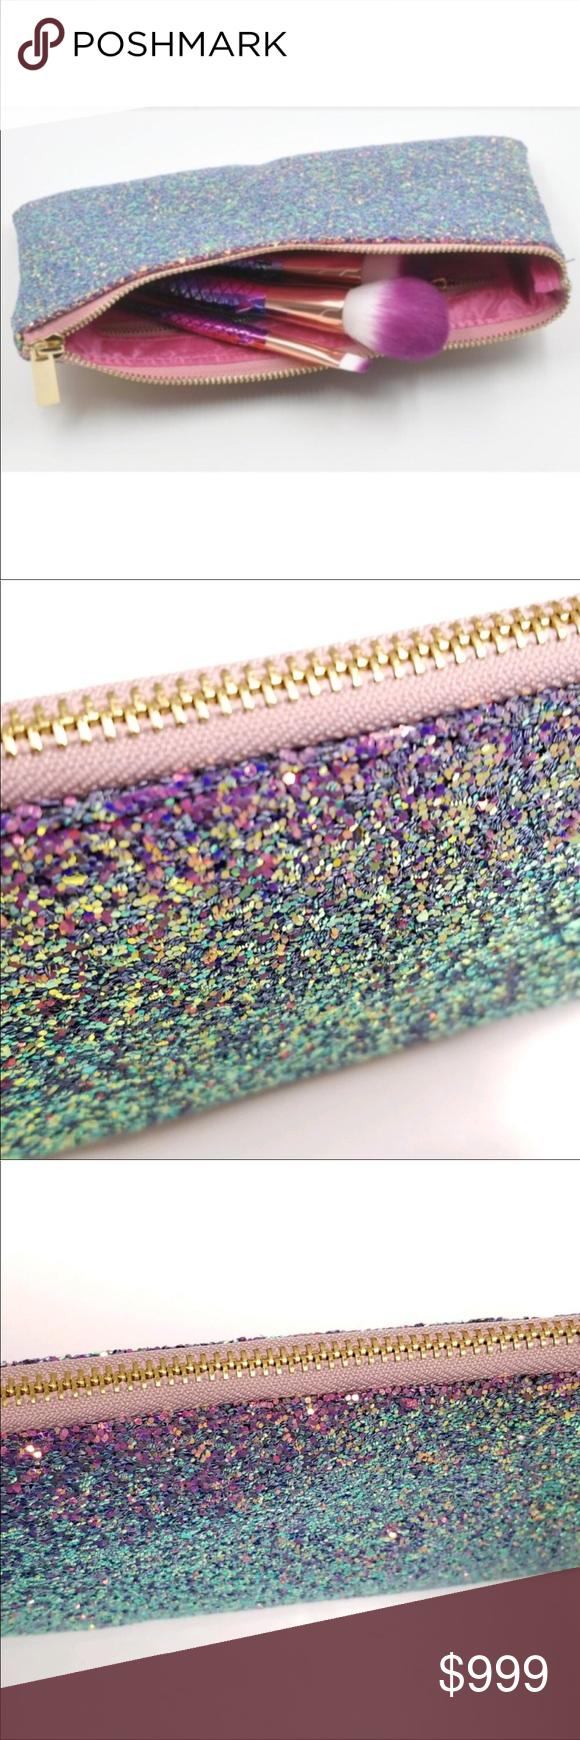 Coming SOON Glitter Makeup Bag Iridescent Coming soon